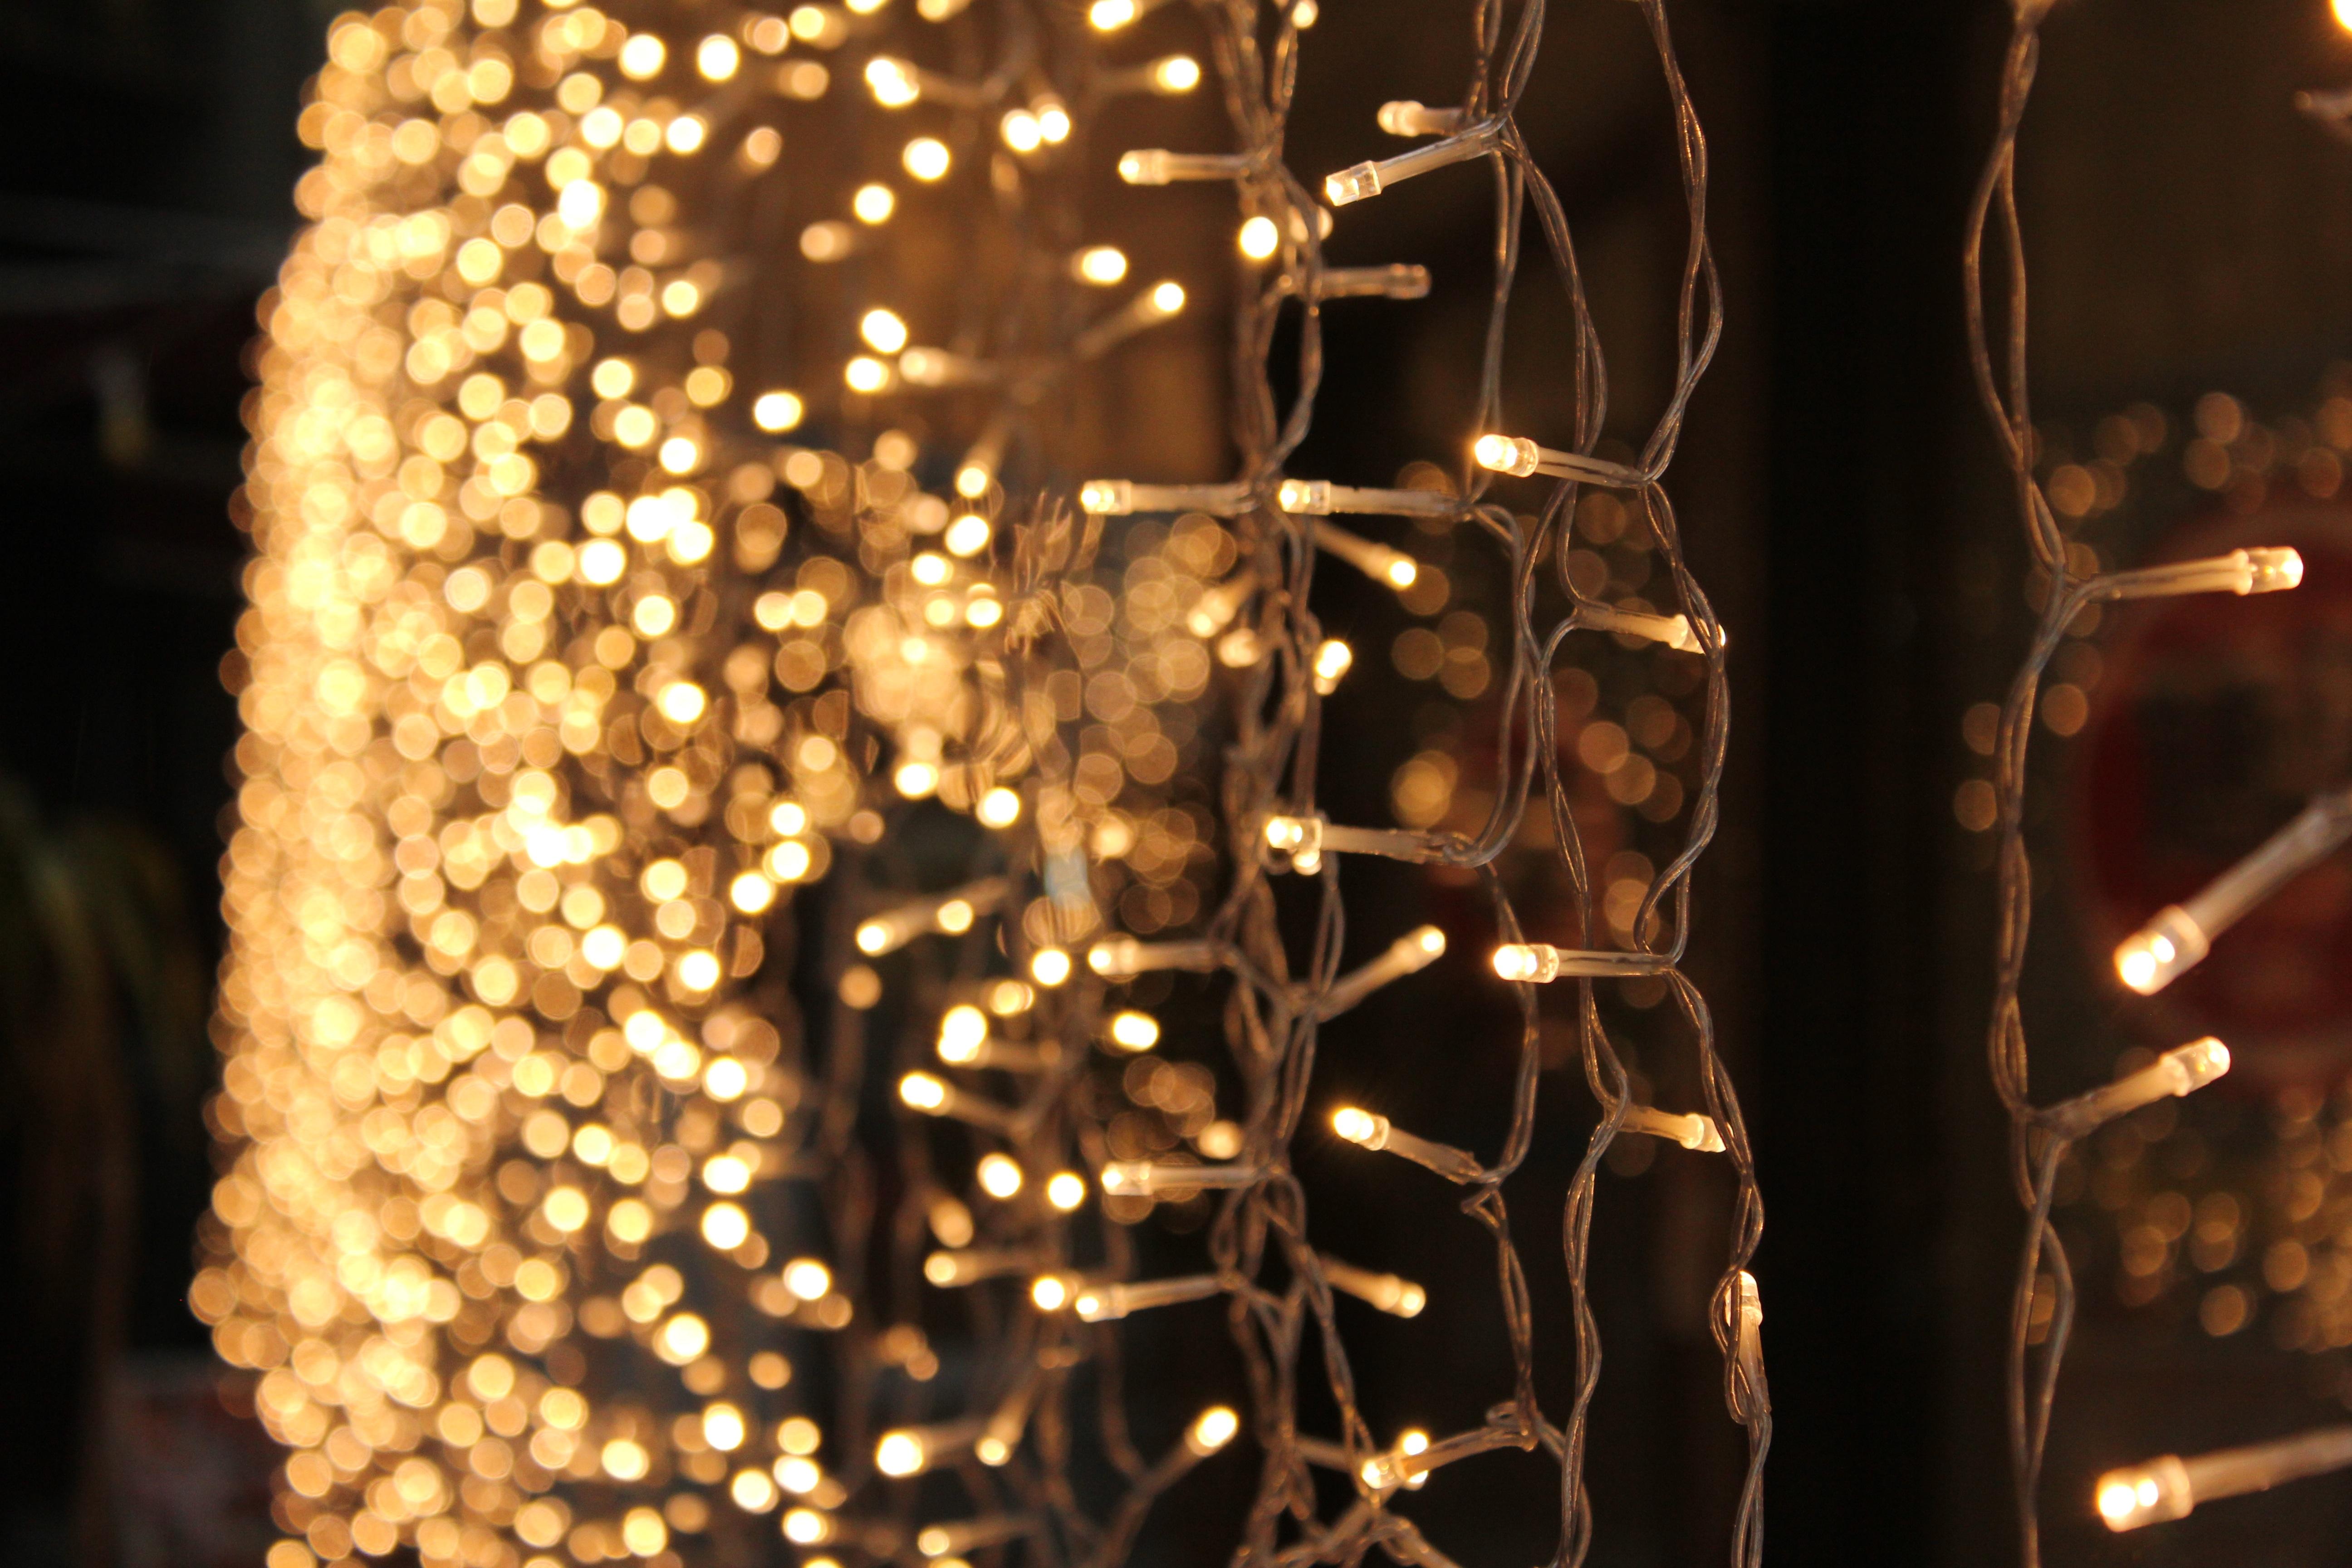 Free Images Blur Glowing Night Sparkler Celebration